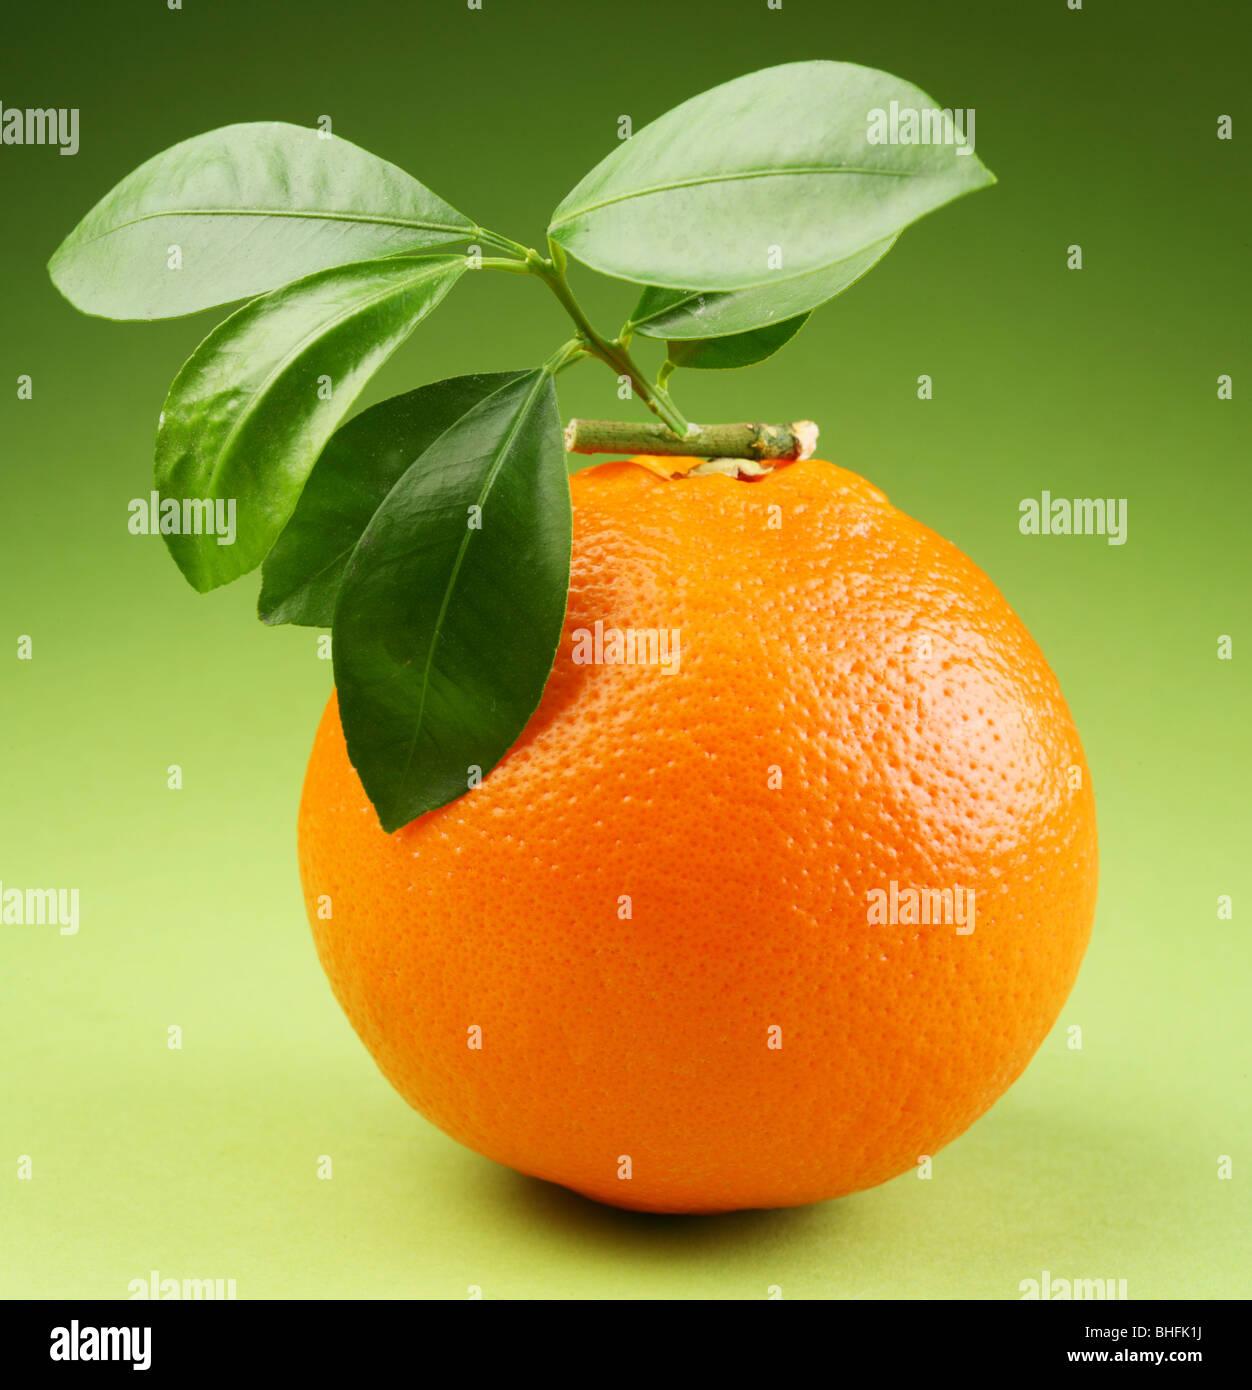 Ripe orange on a green background - Stock Image